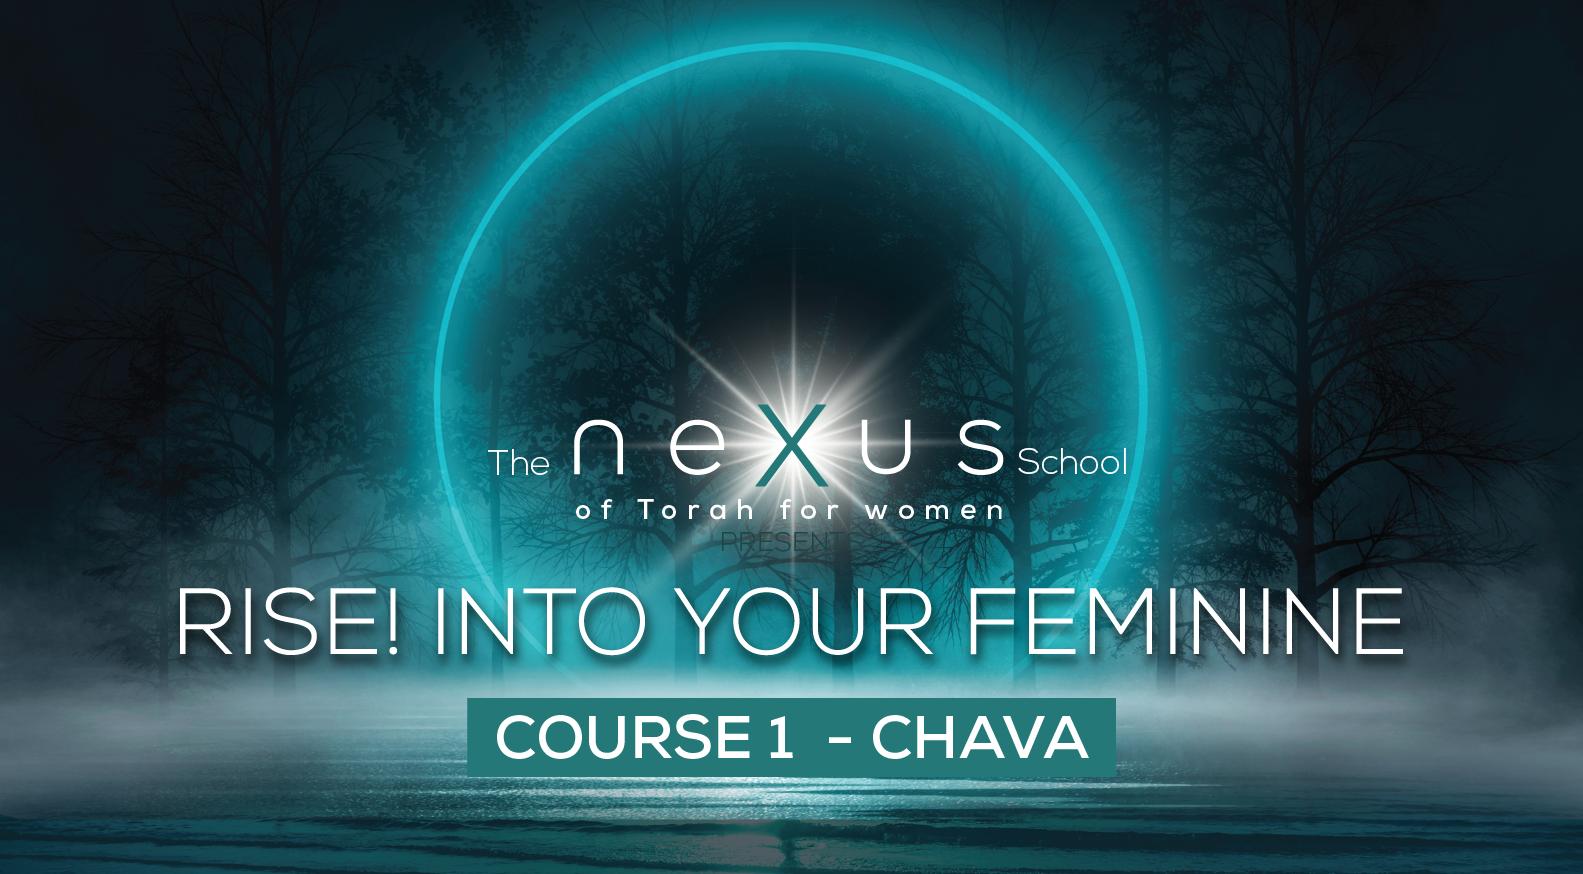 Session 1: Meet YOUR Feminine Archetype